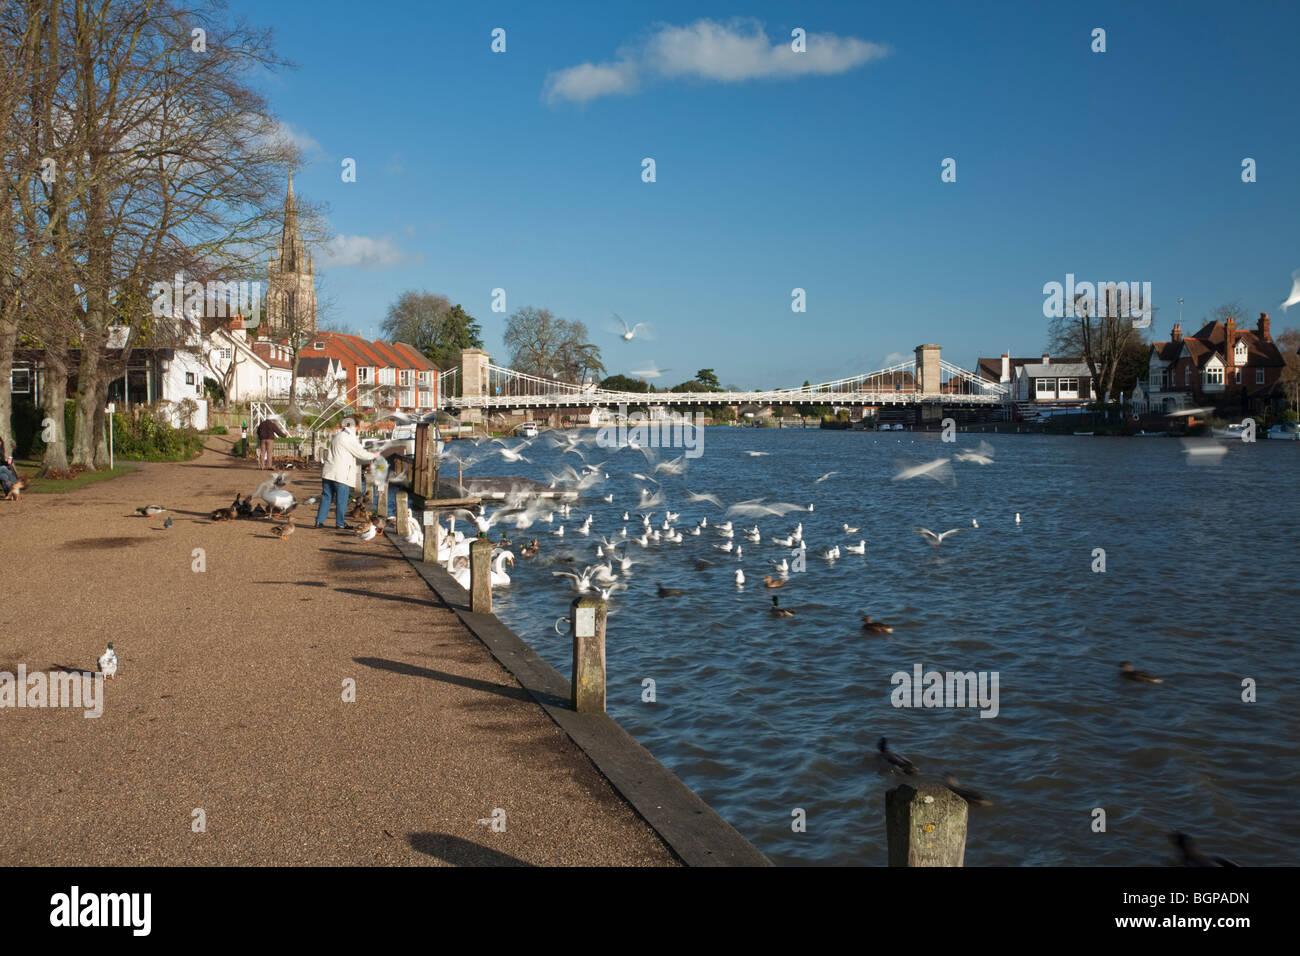 Feeding birds on the Thames promenade at Marlow in Buckinghamshire, Uk Stock Photo